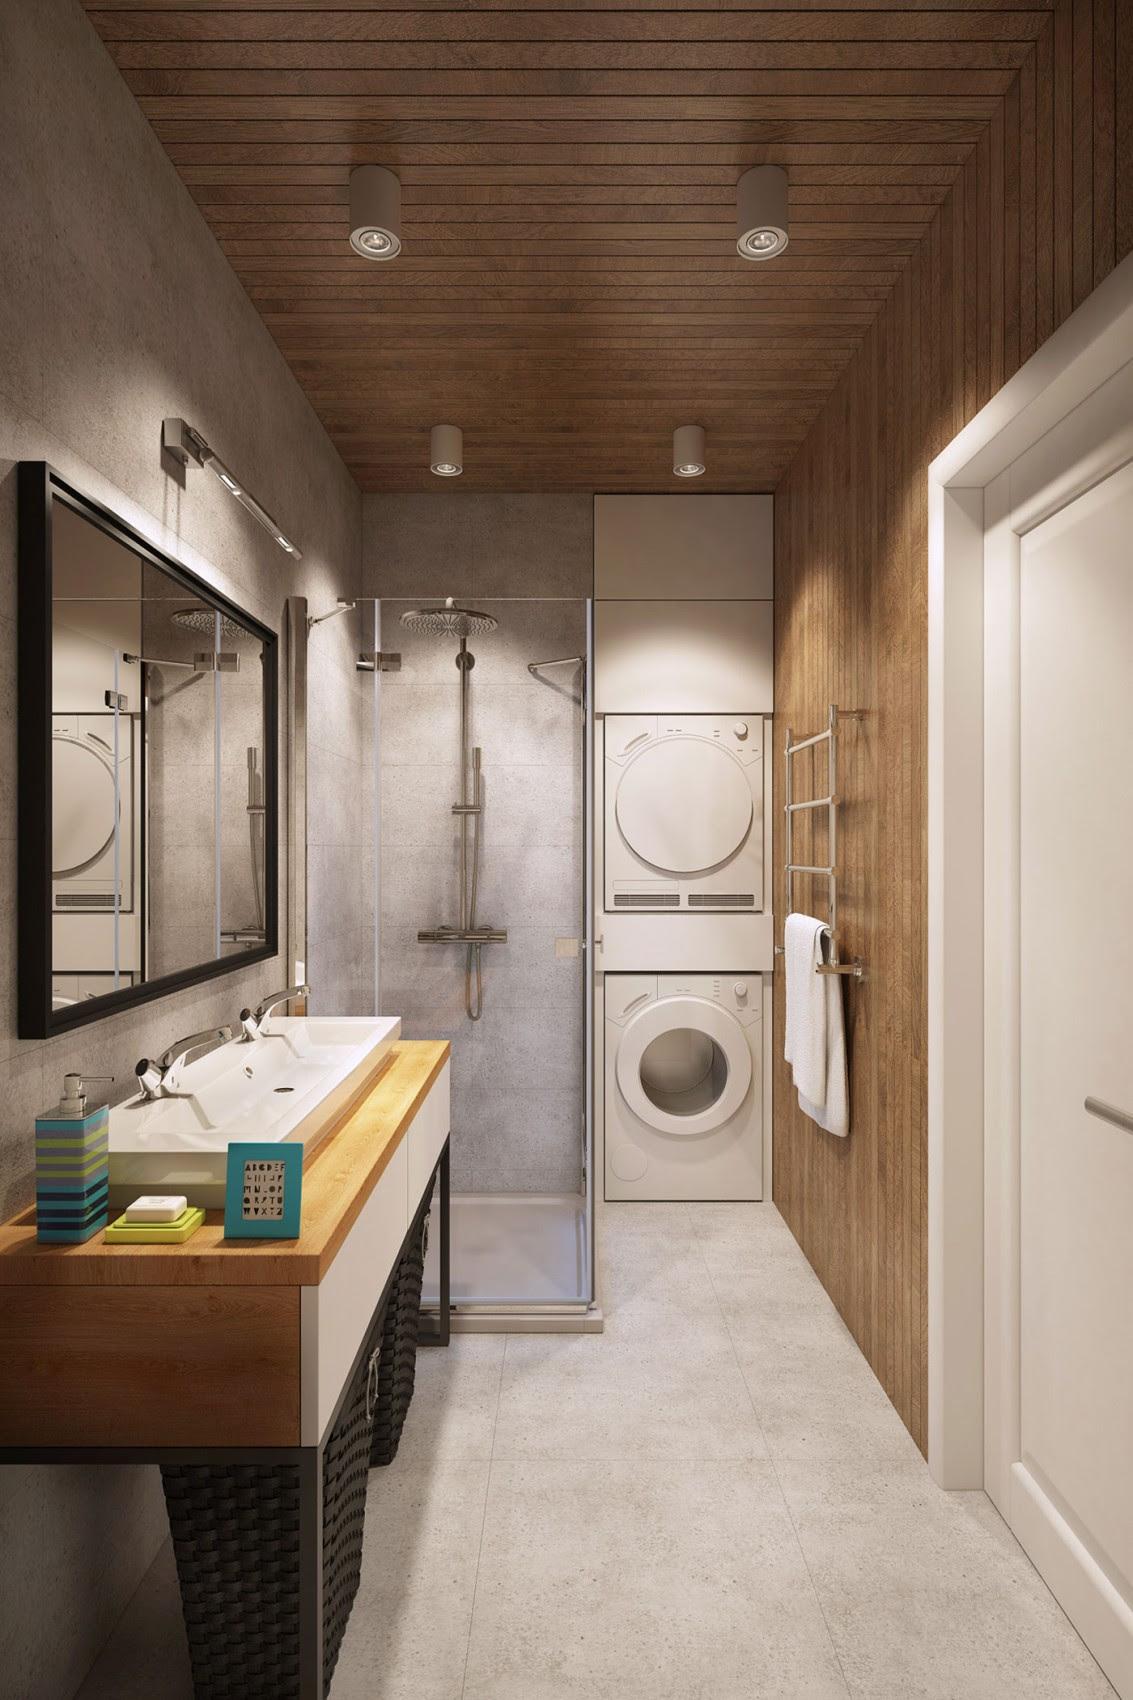 kitchen glass door design  | 625 x 416